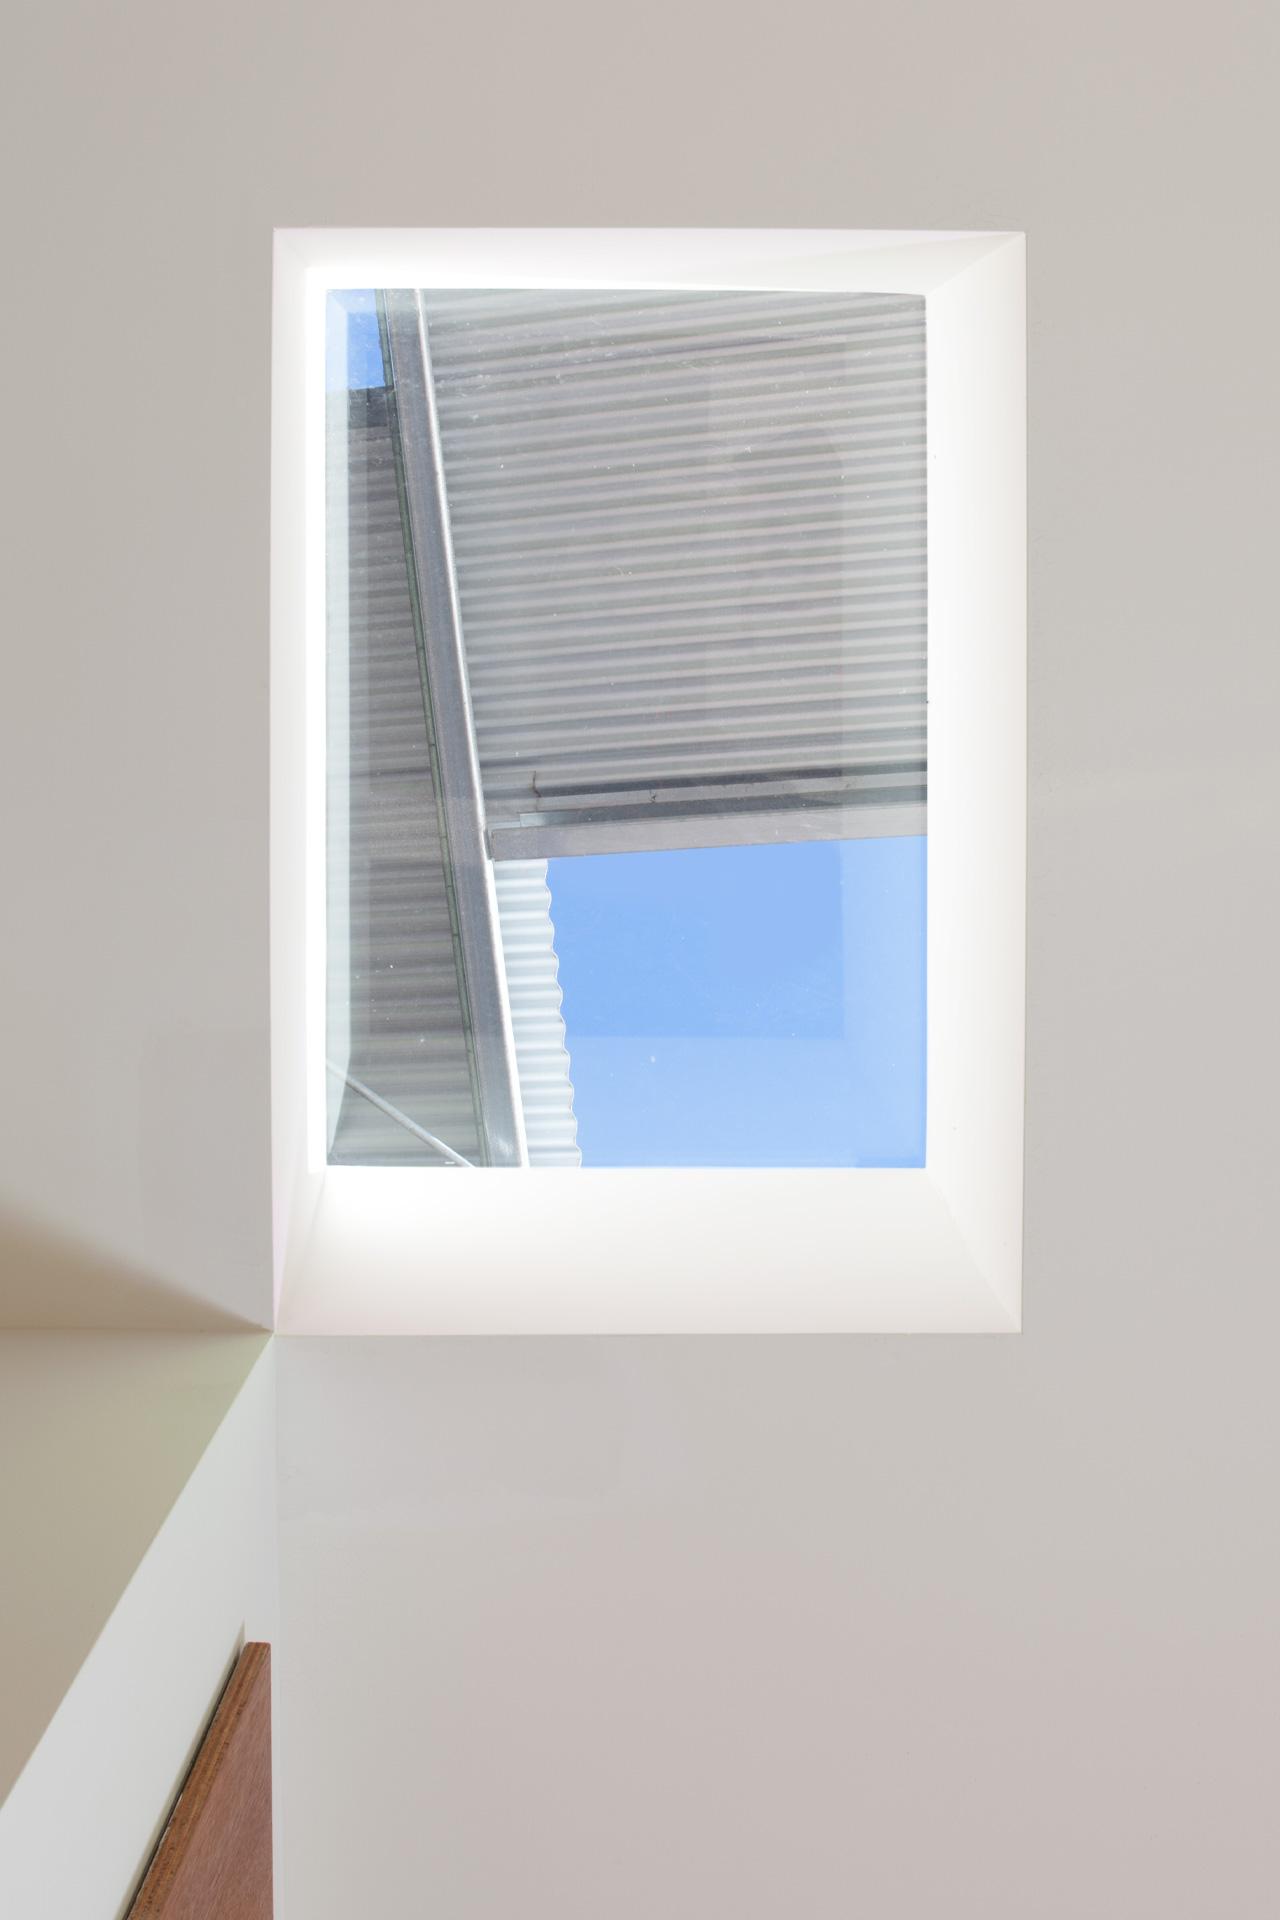 Djerassi Writers Studios interiors